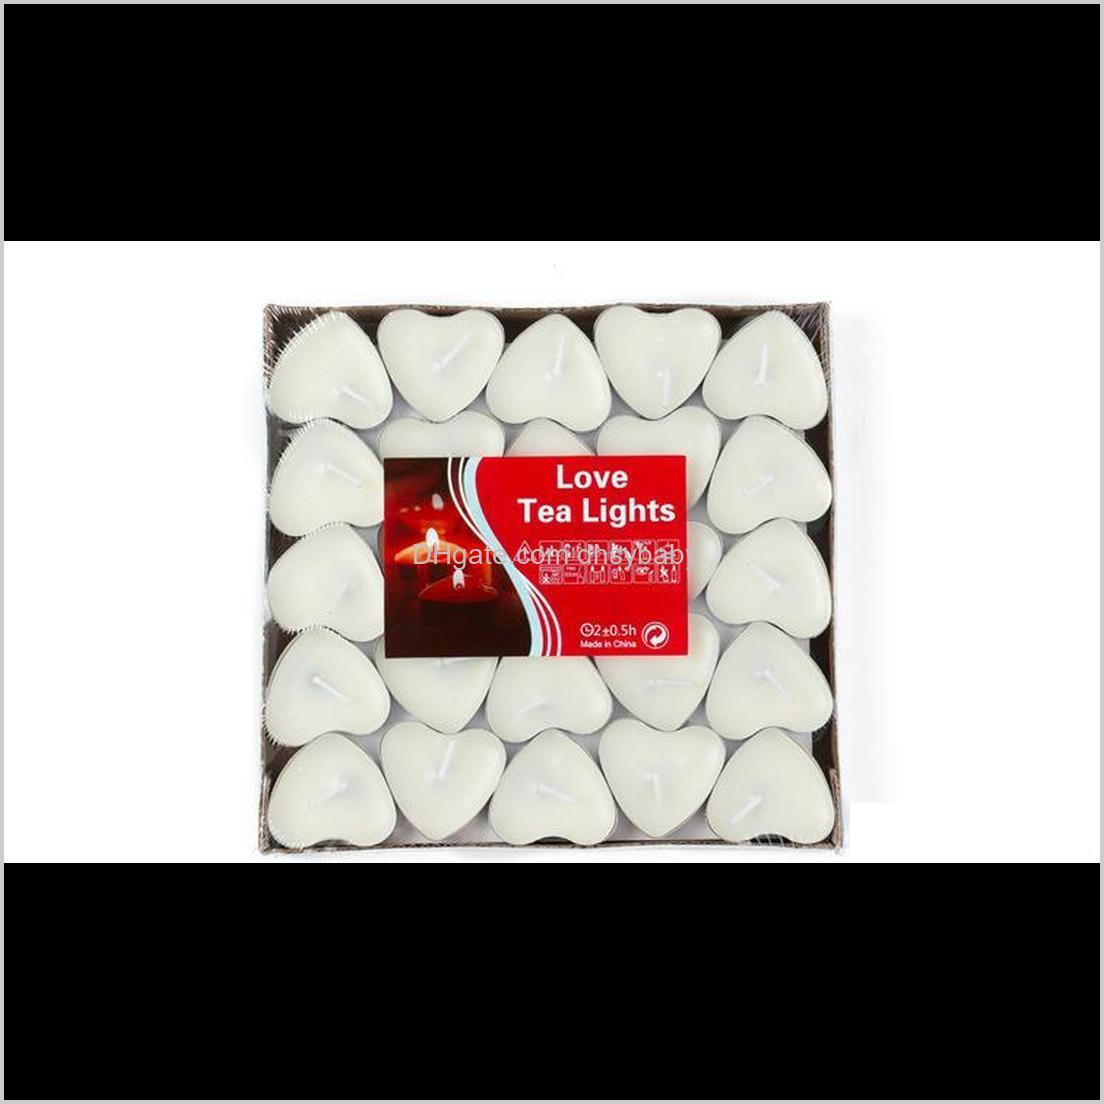 Décor Home & Garden Drop Delivery 2021 Heart-Shaped Ghee 2 Hours Butter 6 Colors 50Pcs/Set Tea Light Candles Non-Smoking Votive Candle Wutxd